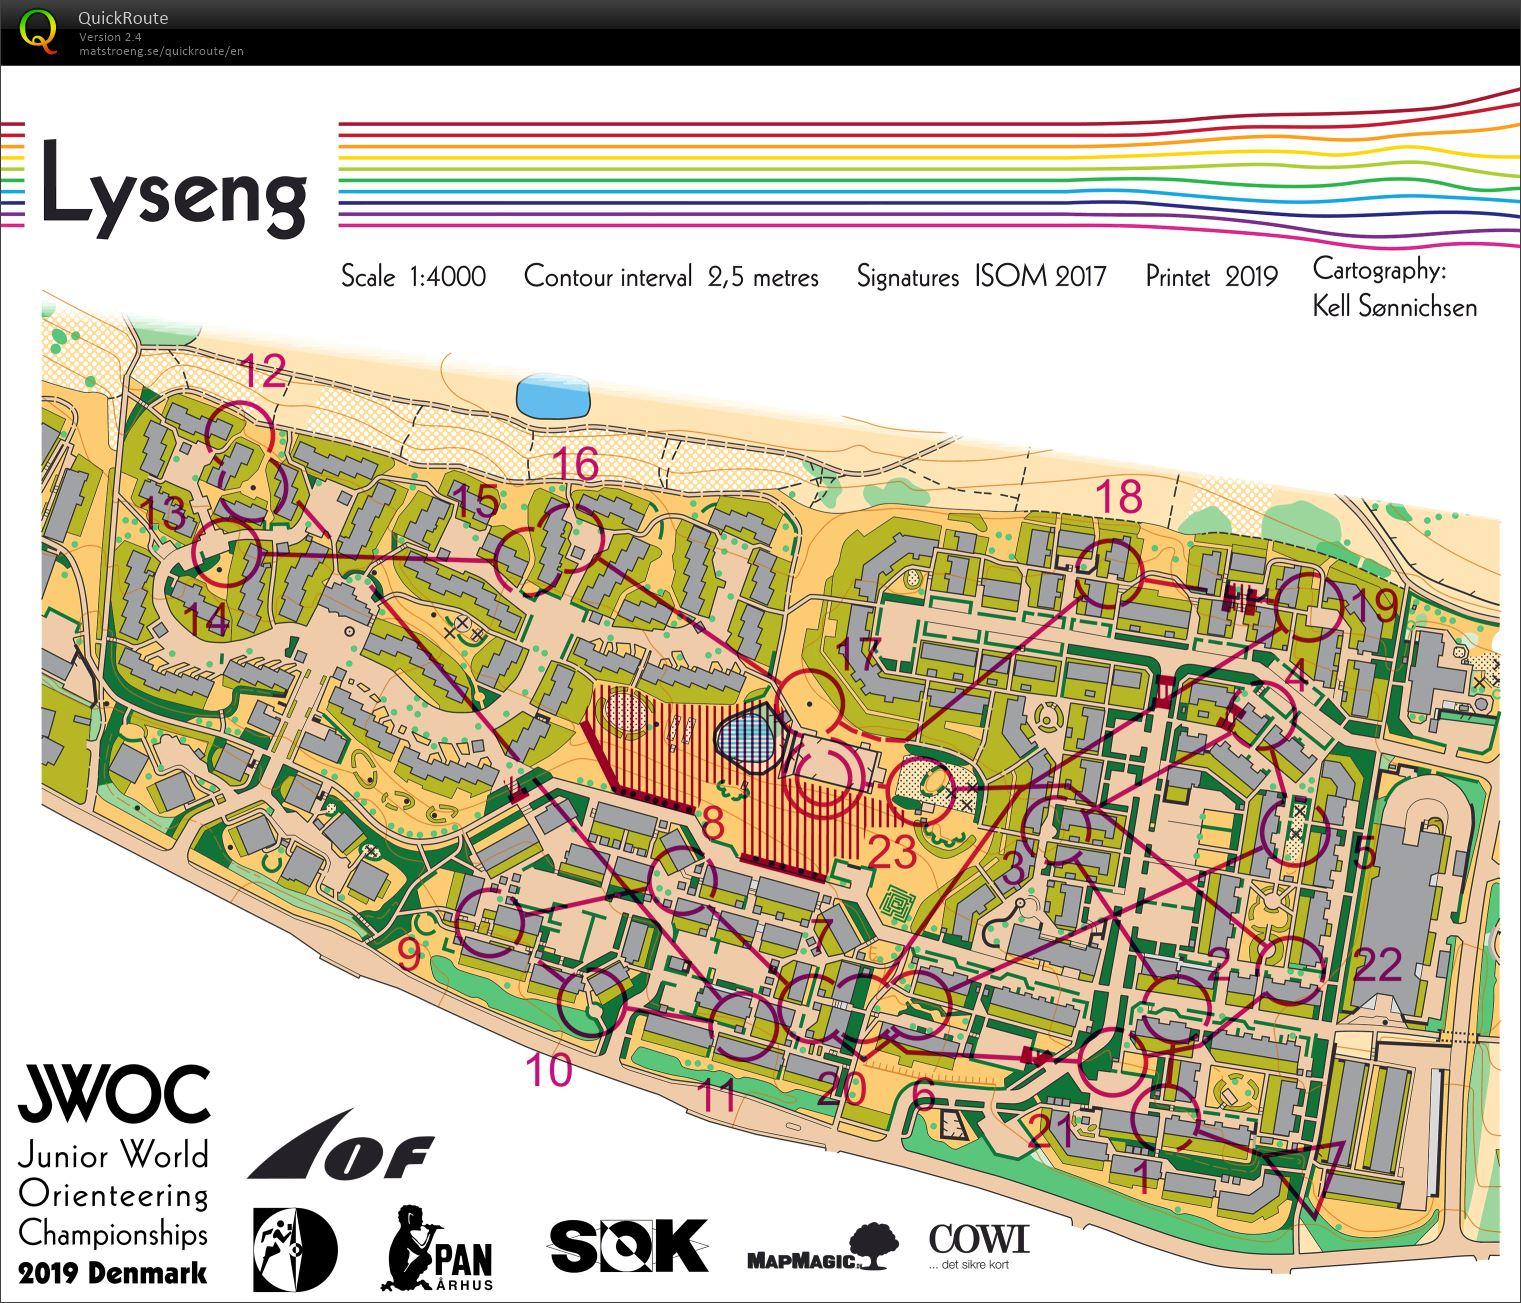 Jr Vm Sprint July 7th 2019 Orienteering Map From Elias Jonsson